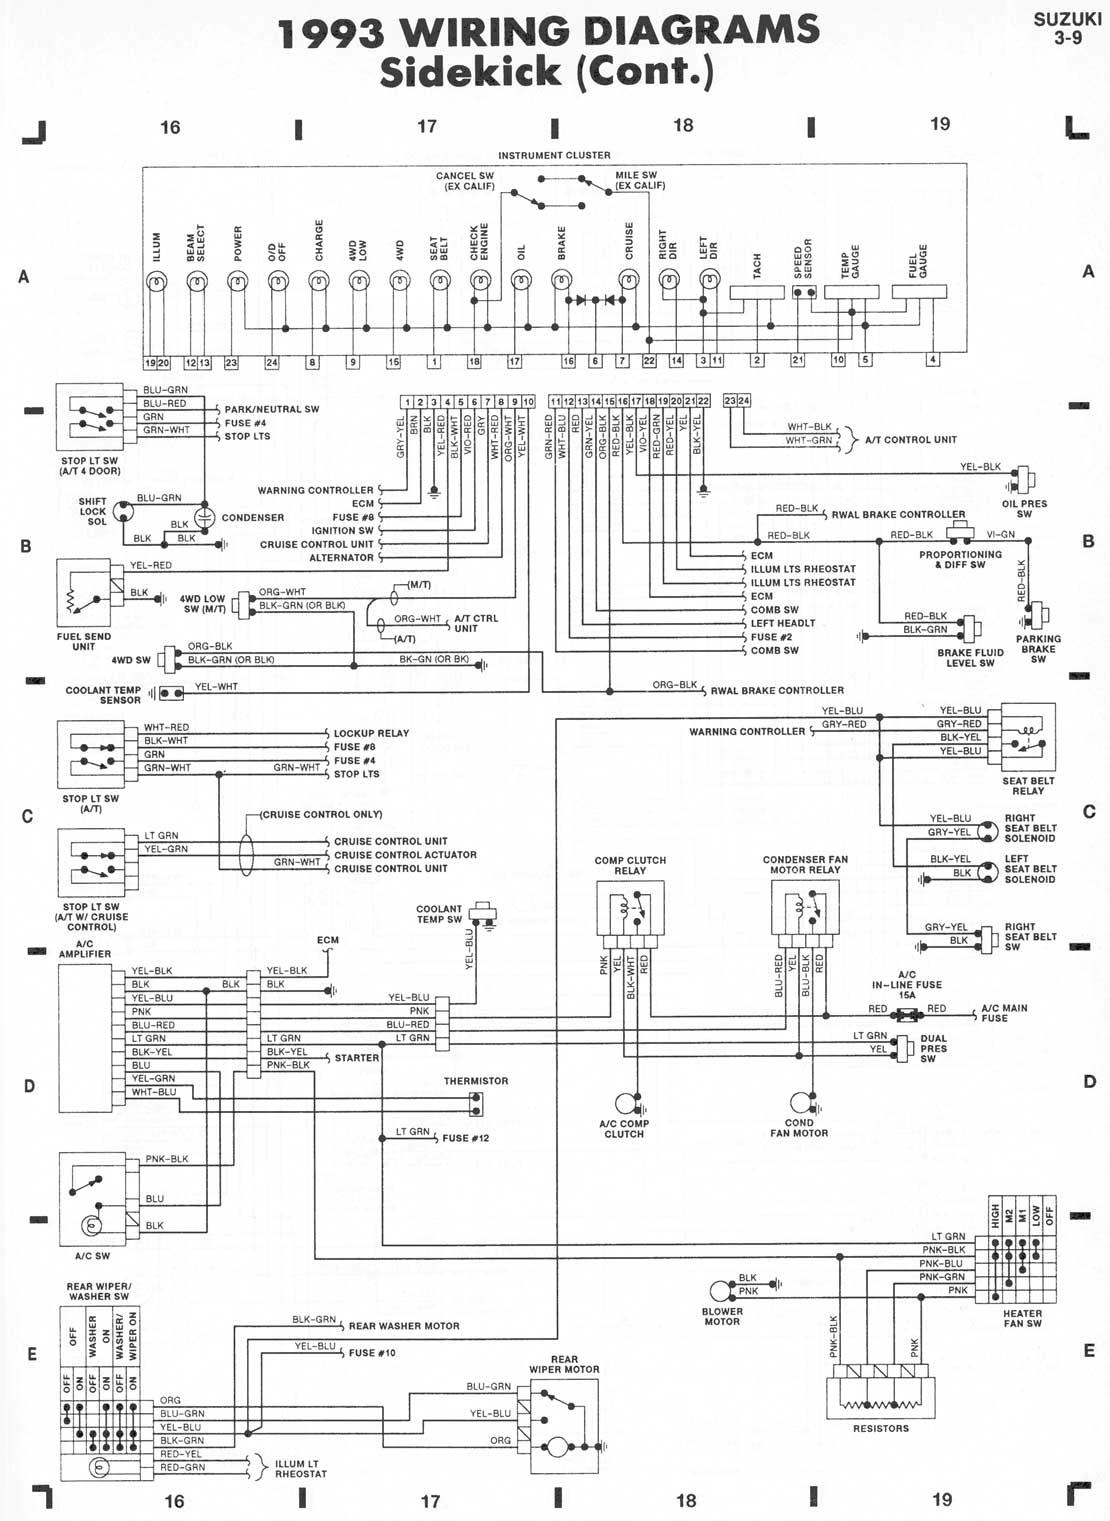 Suz Box Fender besides Suzuki Sidekick Timing Marks Zccpxbu likewise Suzukisidekickorms Toc as well Wiring Diagram Dr Se likewise Fule Pump. on 1990 suzuki sidekick wiring diagram